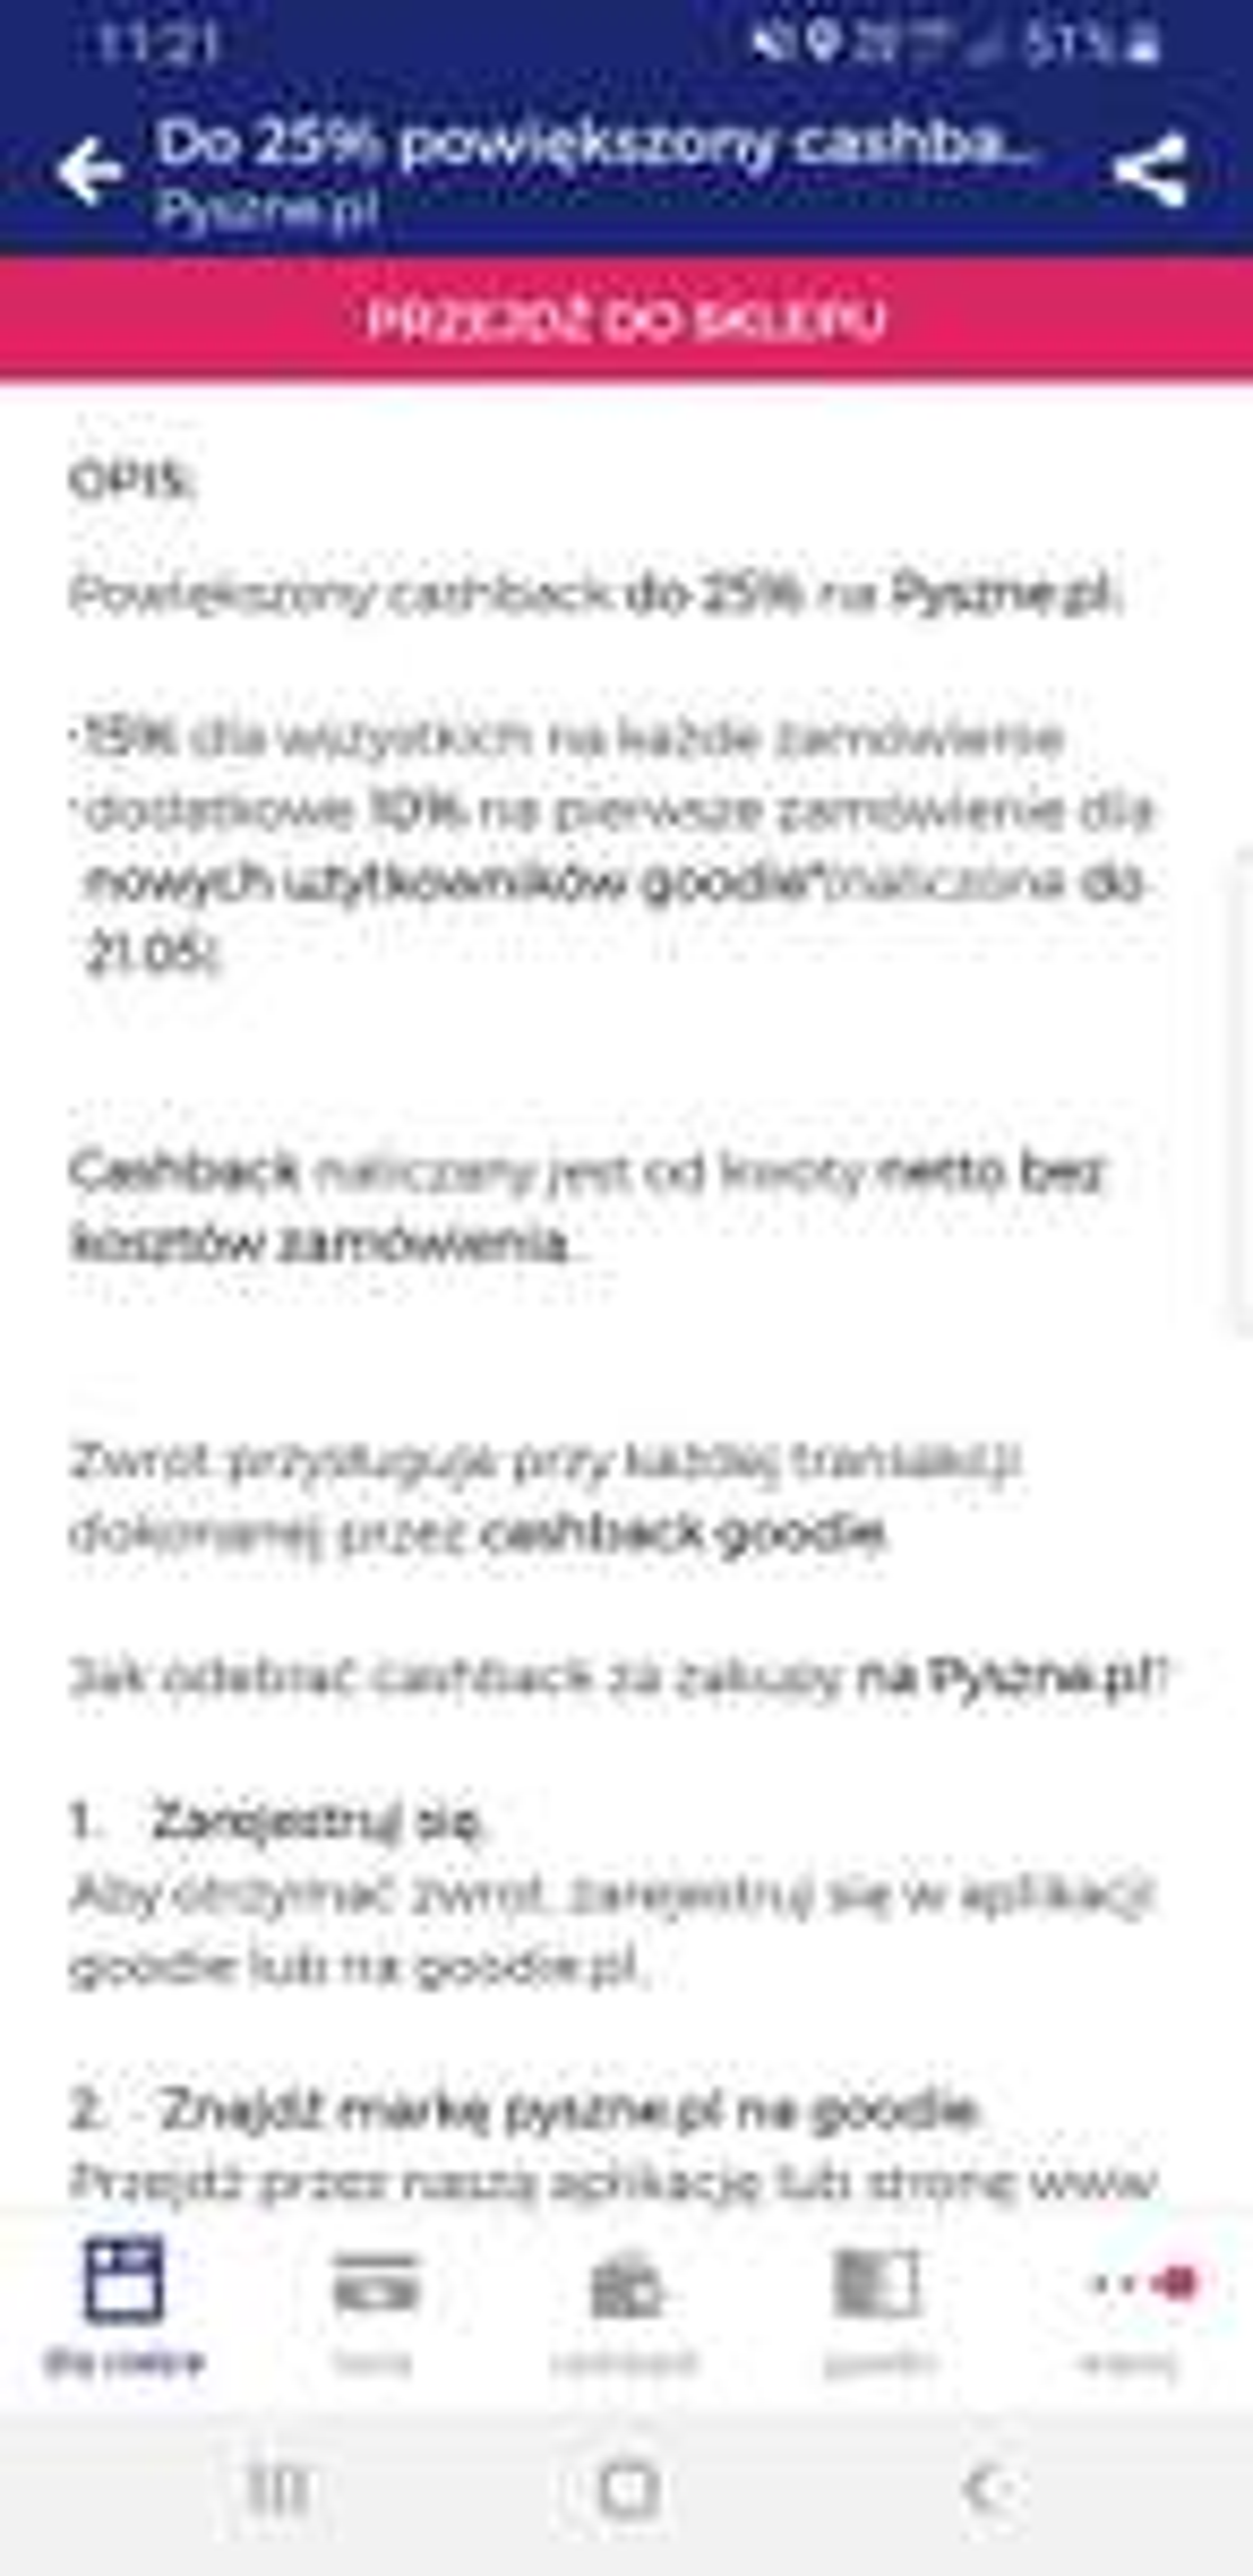 Pyszne.pl - cashback do 25% od goodie